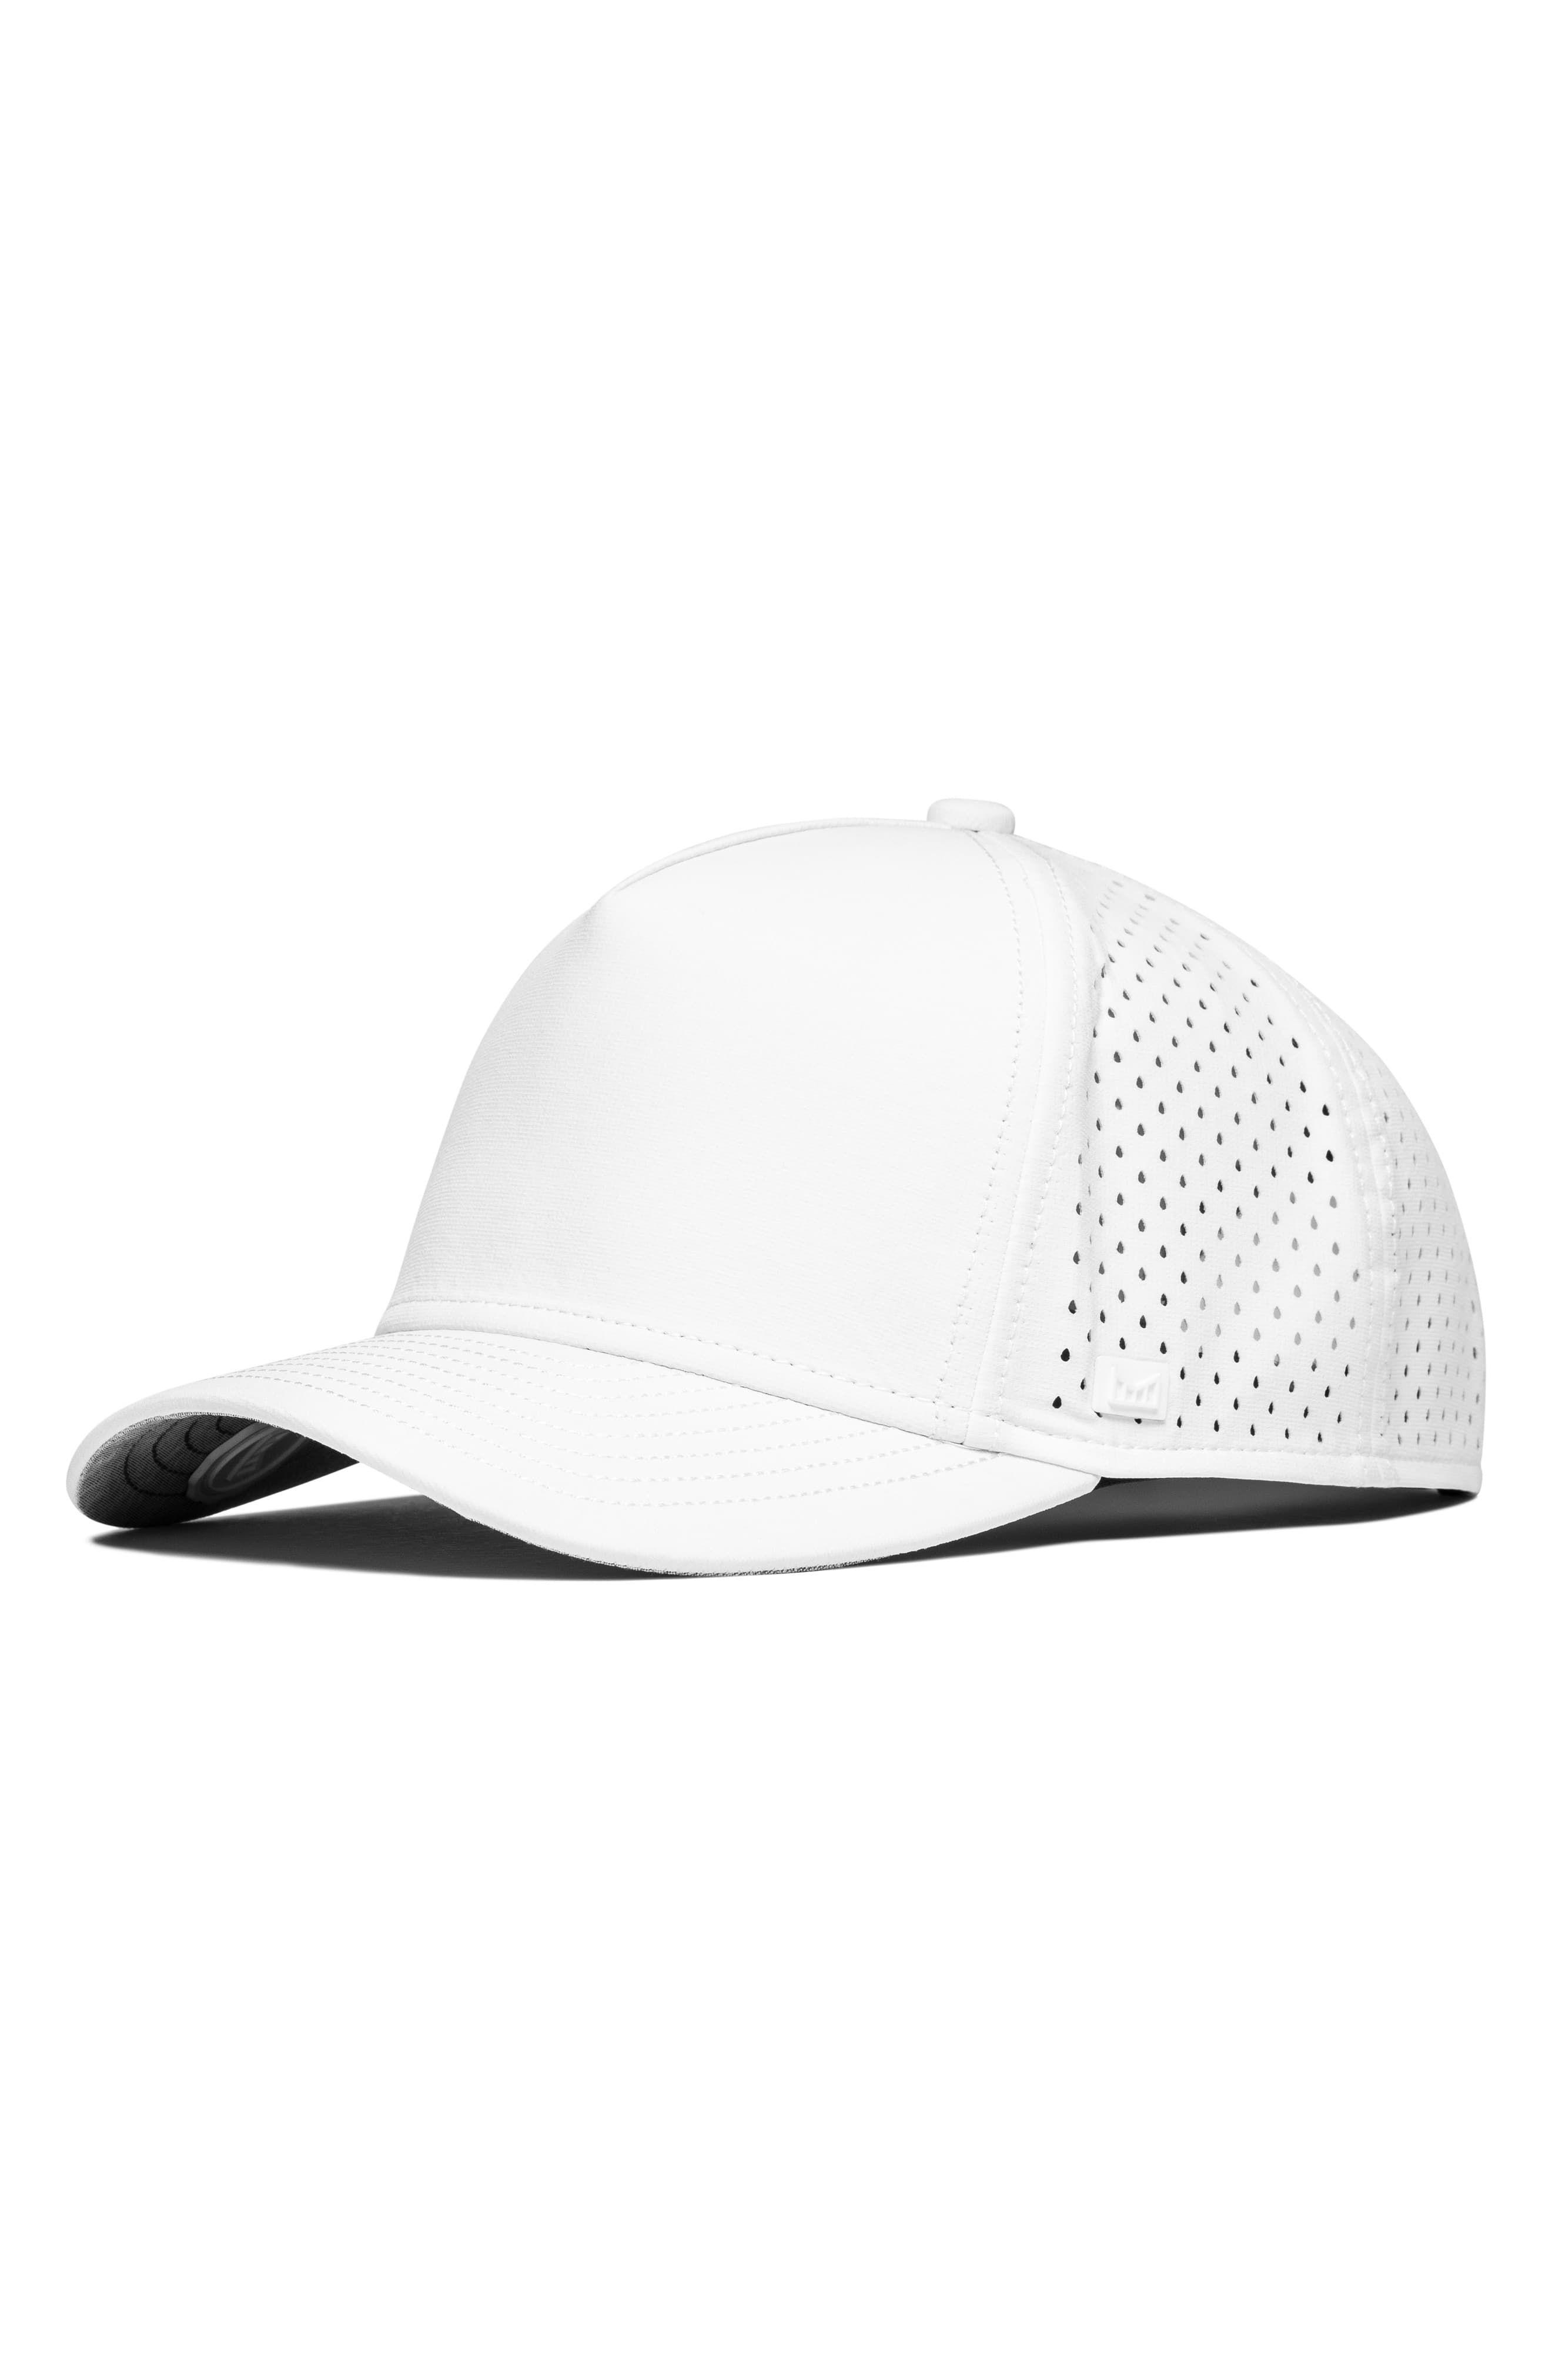 56f60f5f4bd Men's Melin Hydro Odyssey Snapback Baseball Cap - Black in 2019 ...